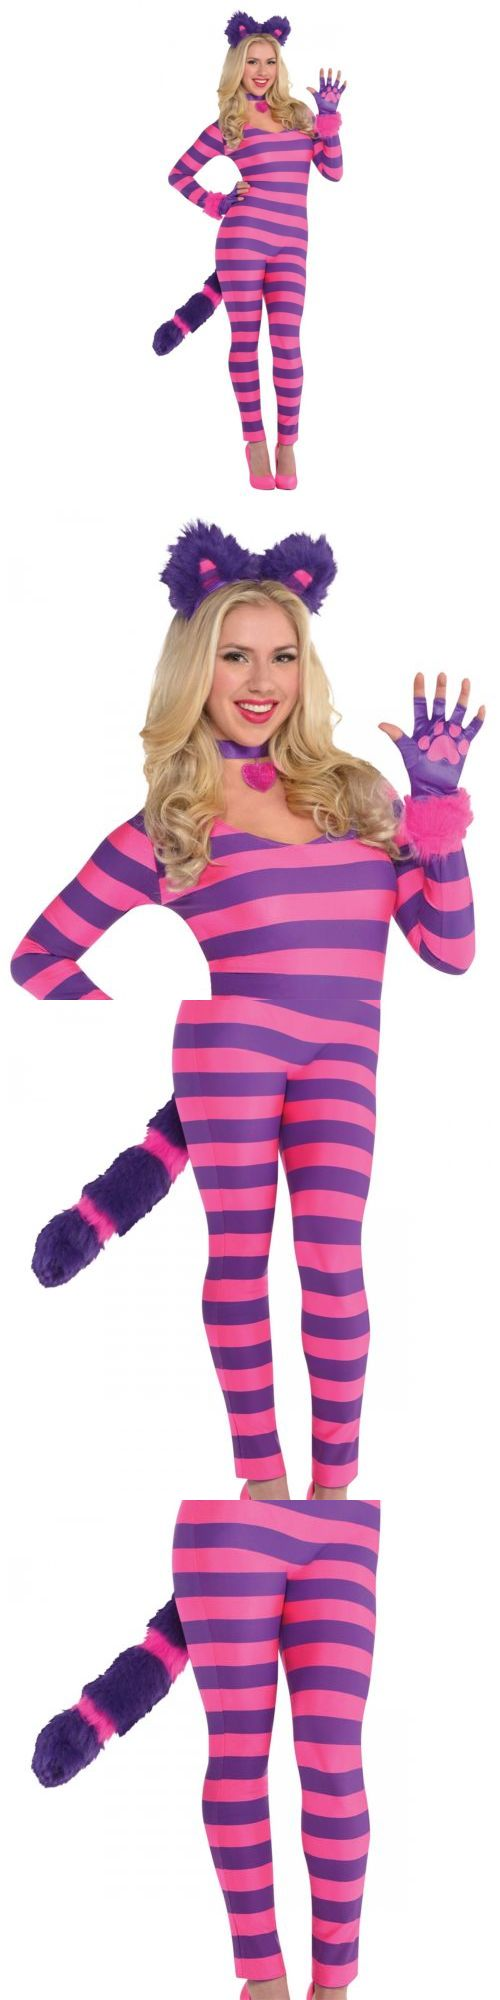 Halloween Costumes Women: Cheshire Cat Costume Adult Alice In Wonderland Halloween Fancy Dress -> BUY IT NOW ONLY: $49.89 on eBay!